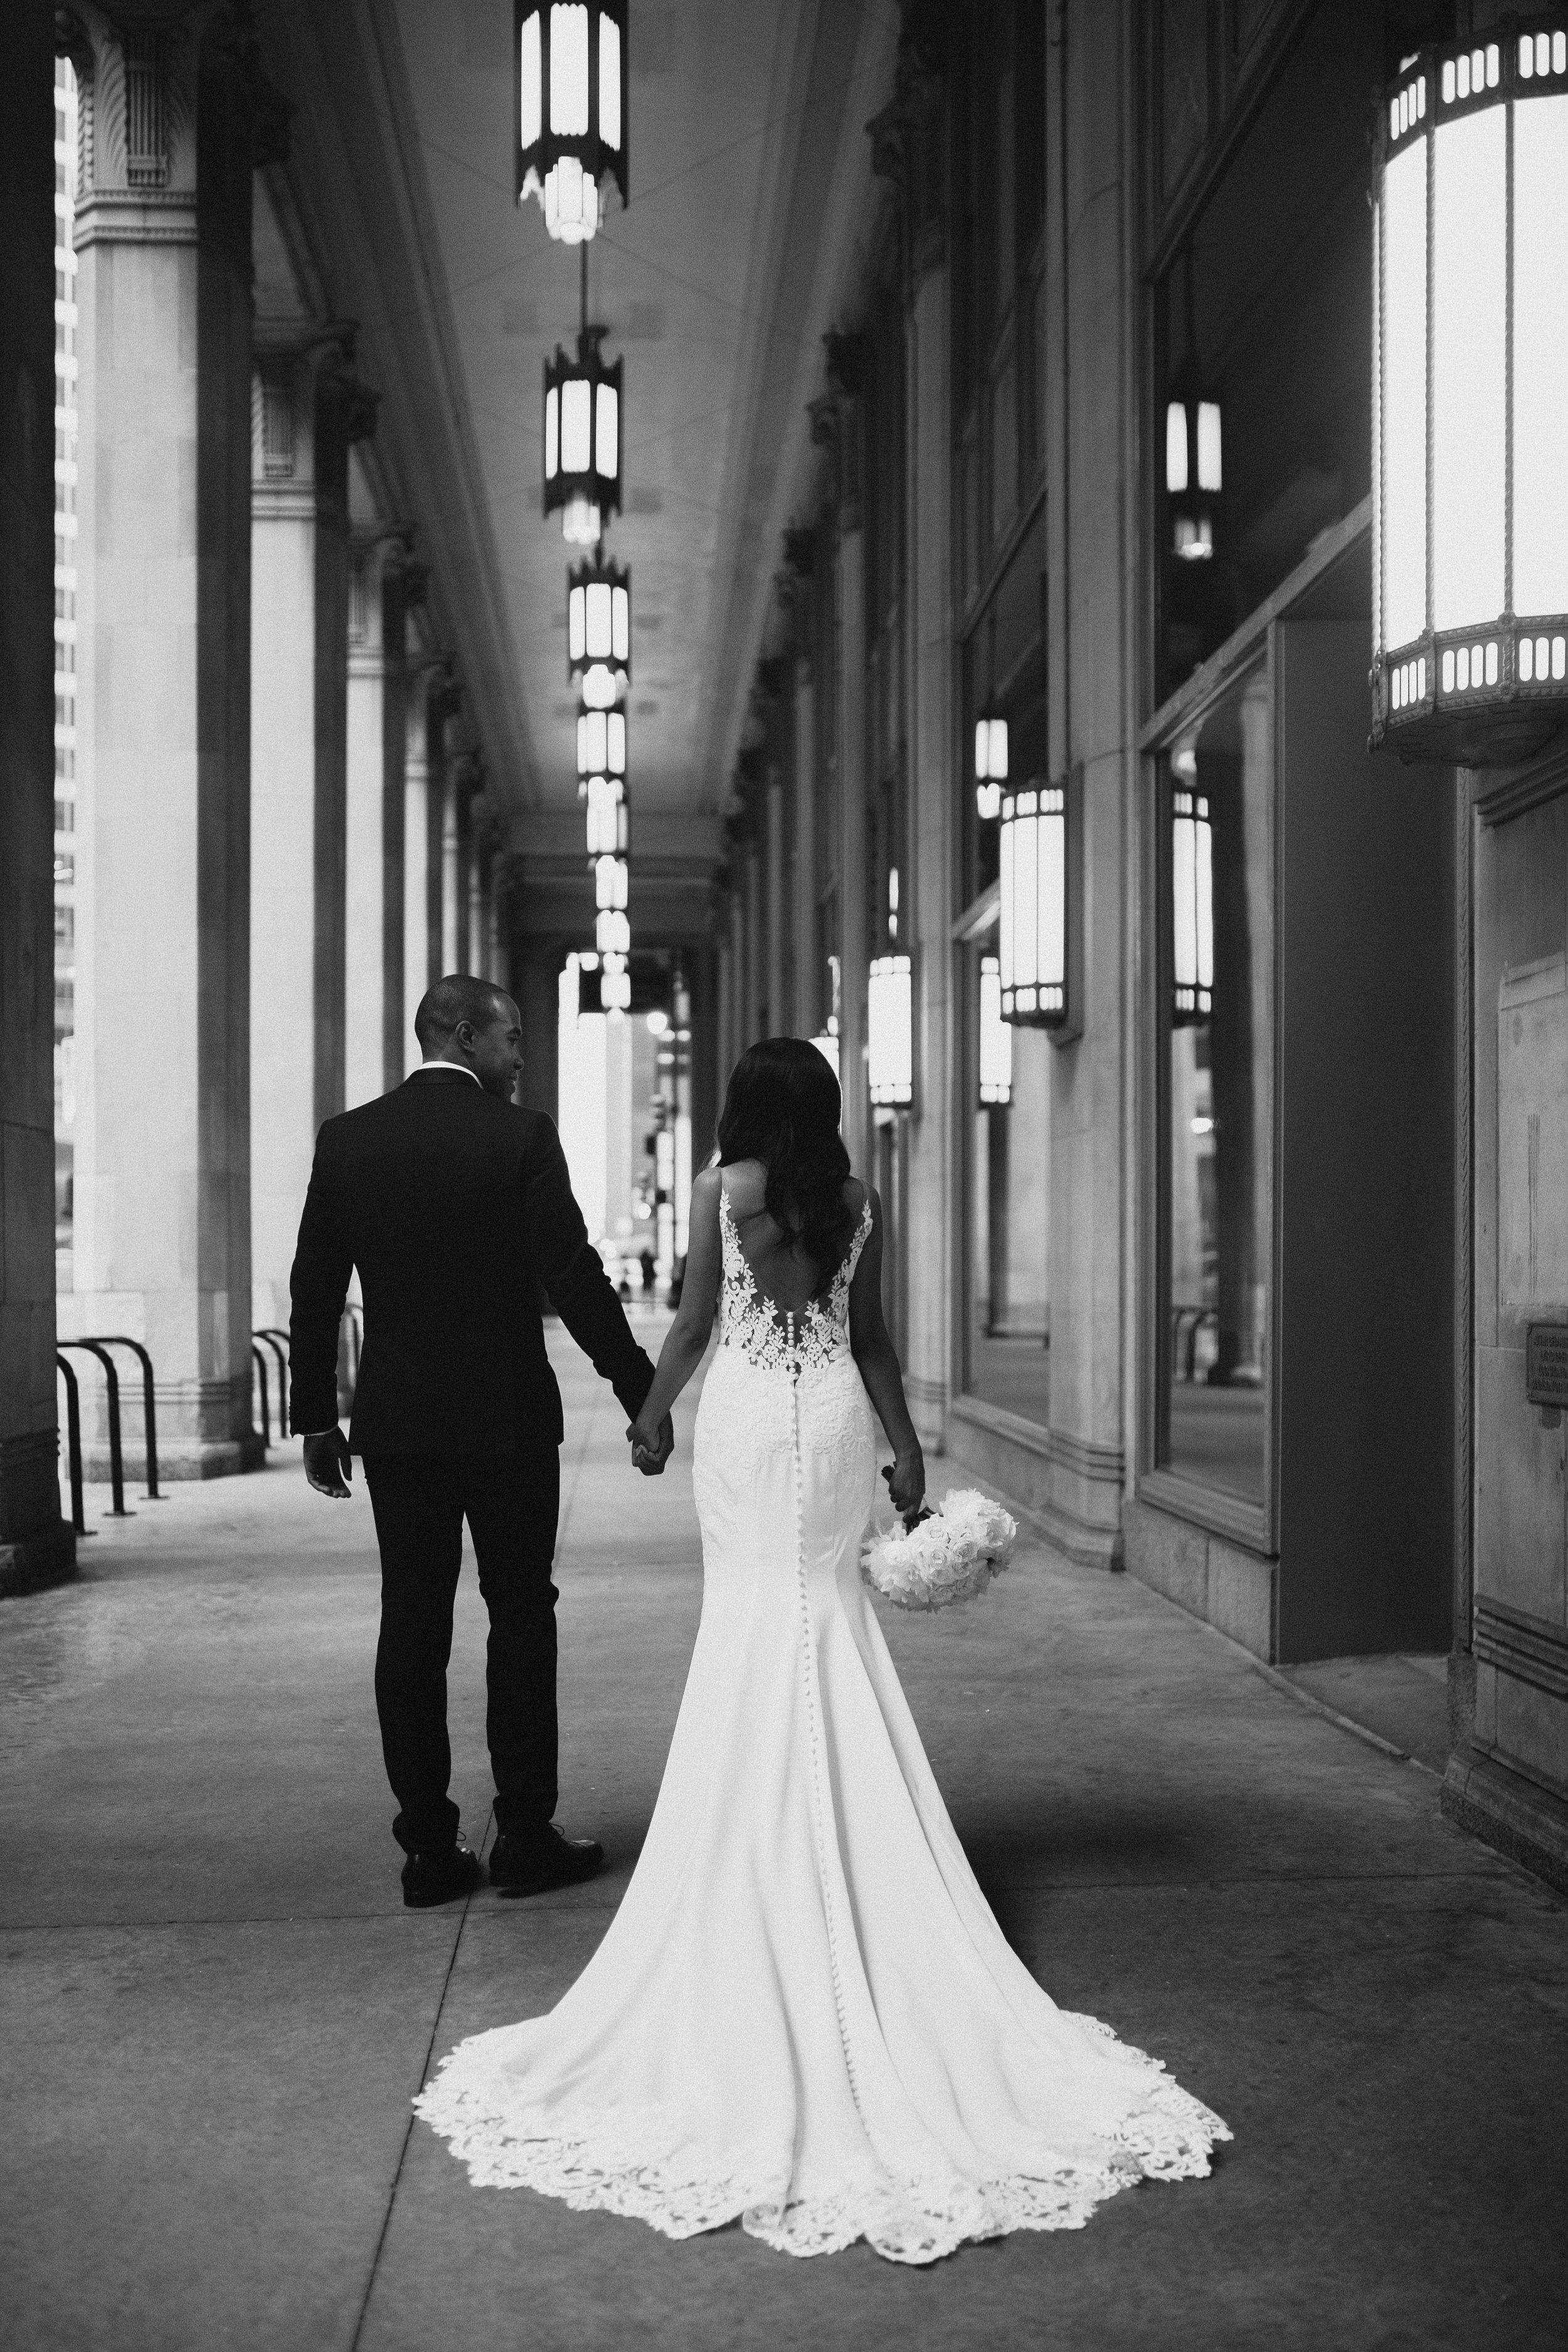 Mindy&Jared-wedding-by-LadiesAndGentlemen-by-Matija-Vuri-4181.jpg